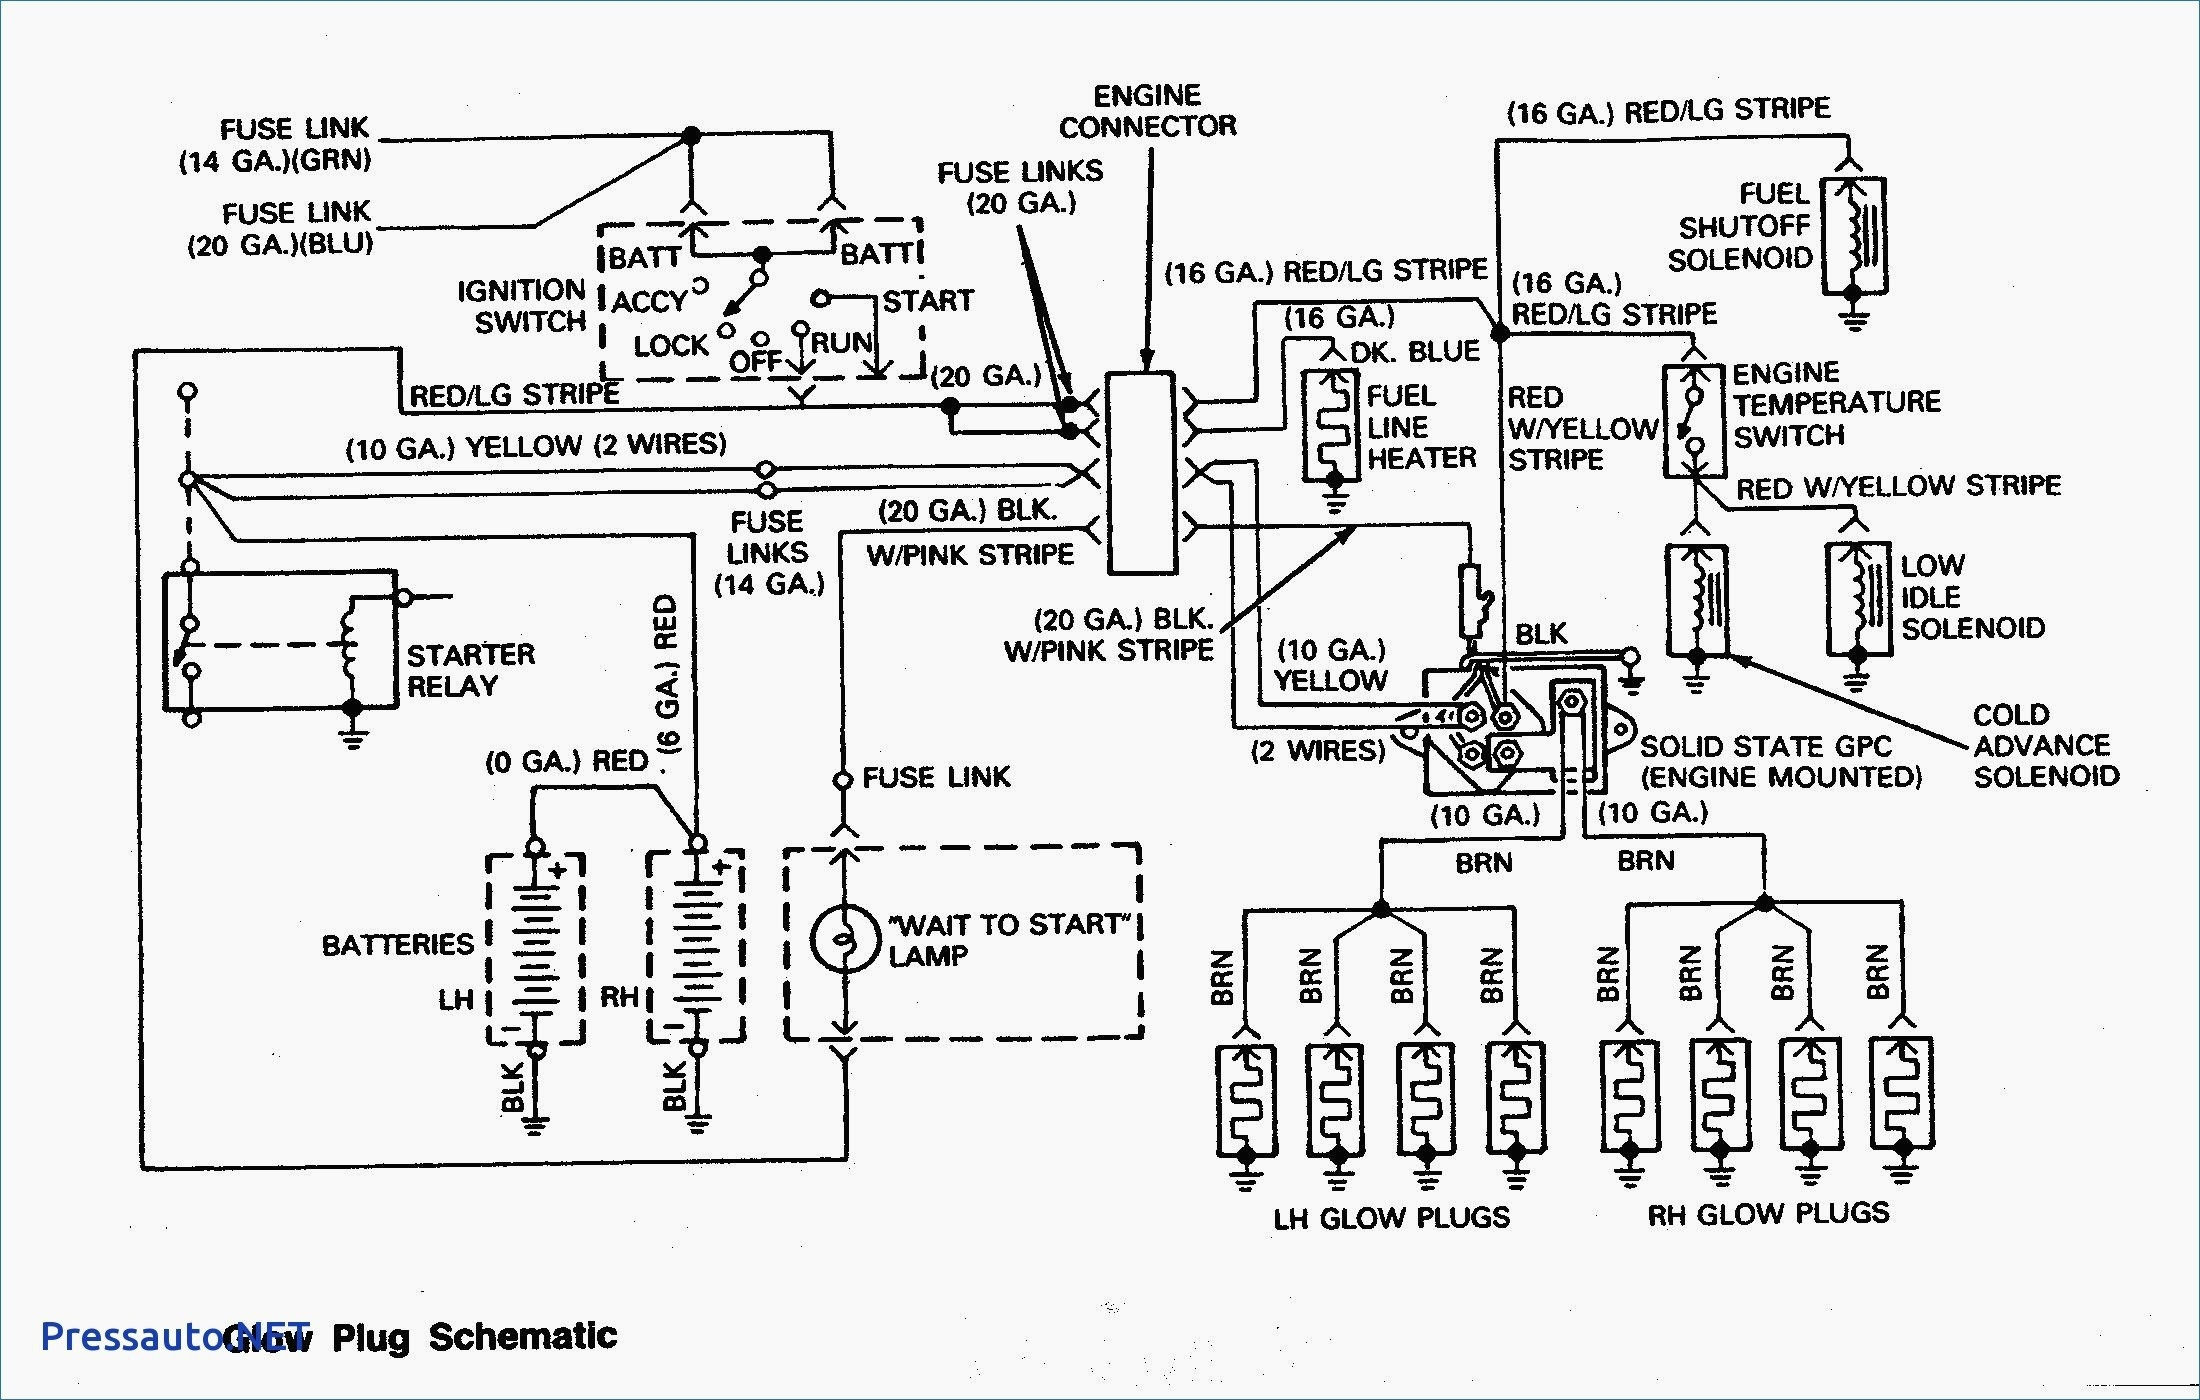 7 3 powerstroke engine wiring diagram chicago union station track 2001 schematic diagram7 glow plug relay simple